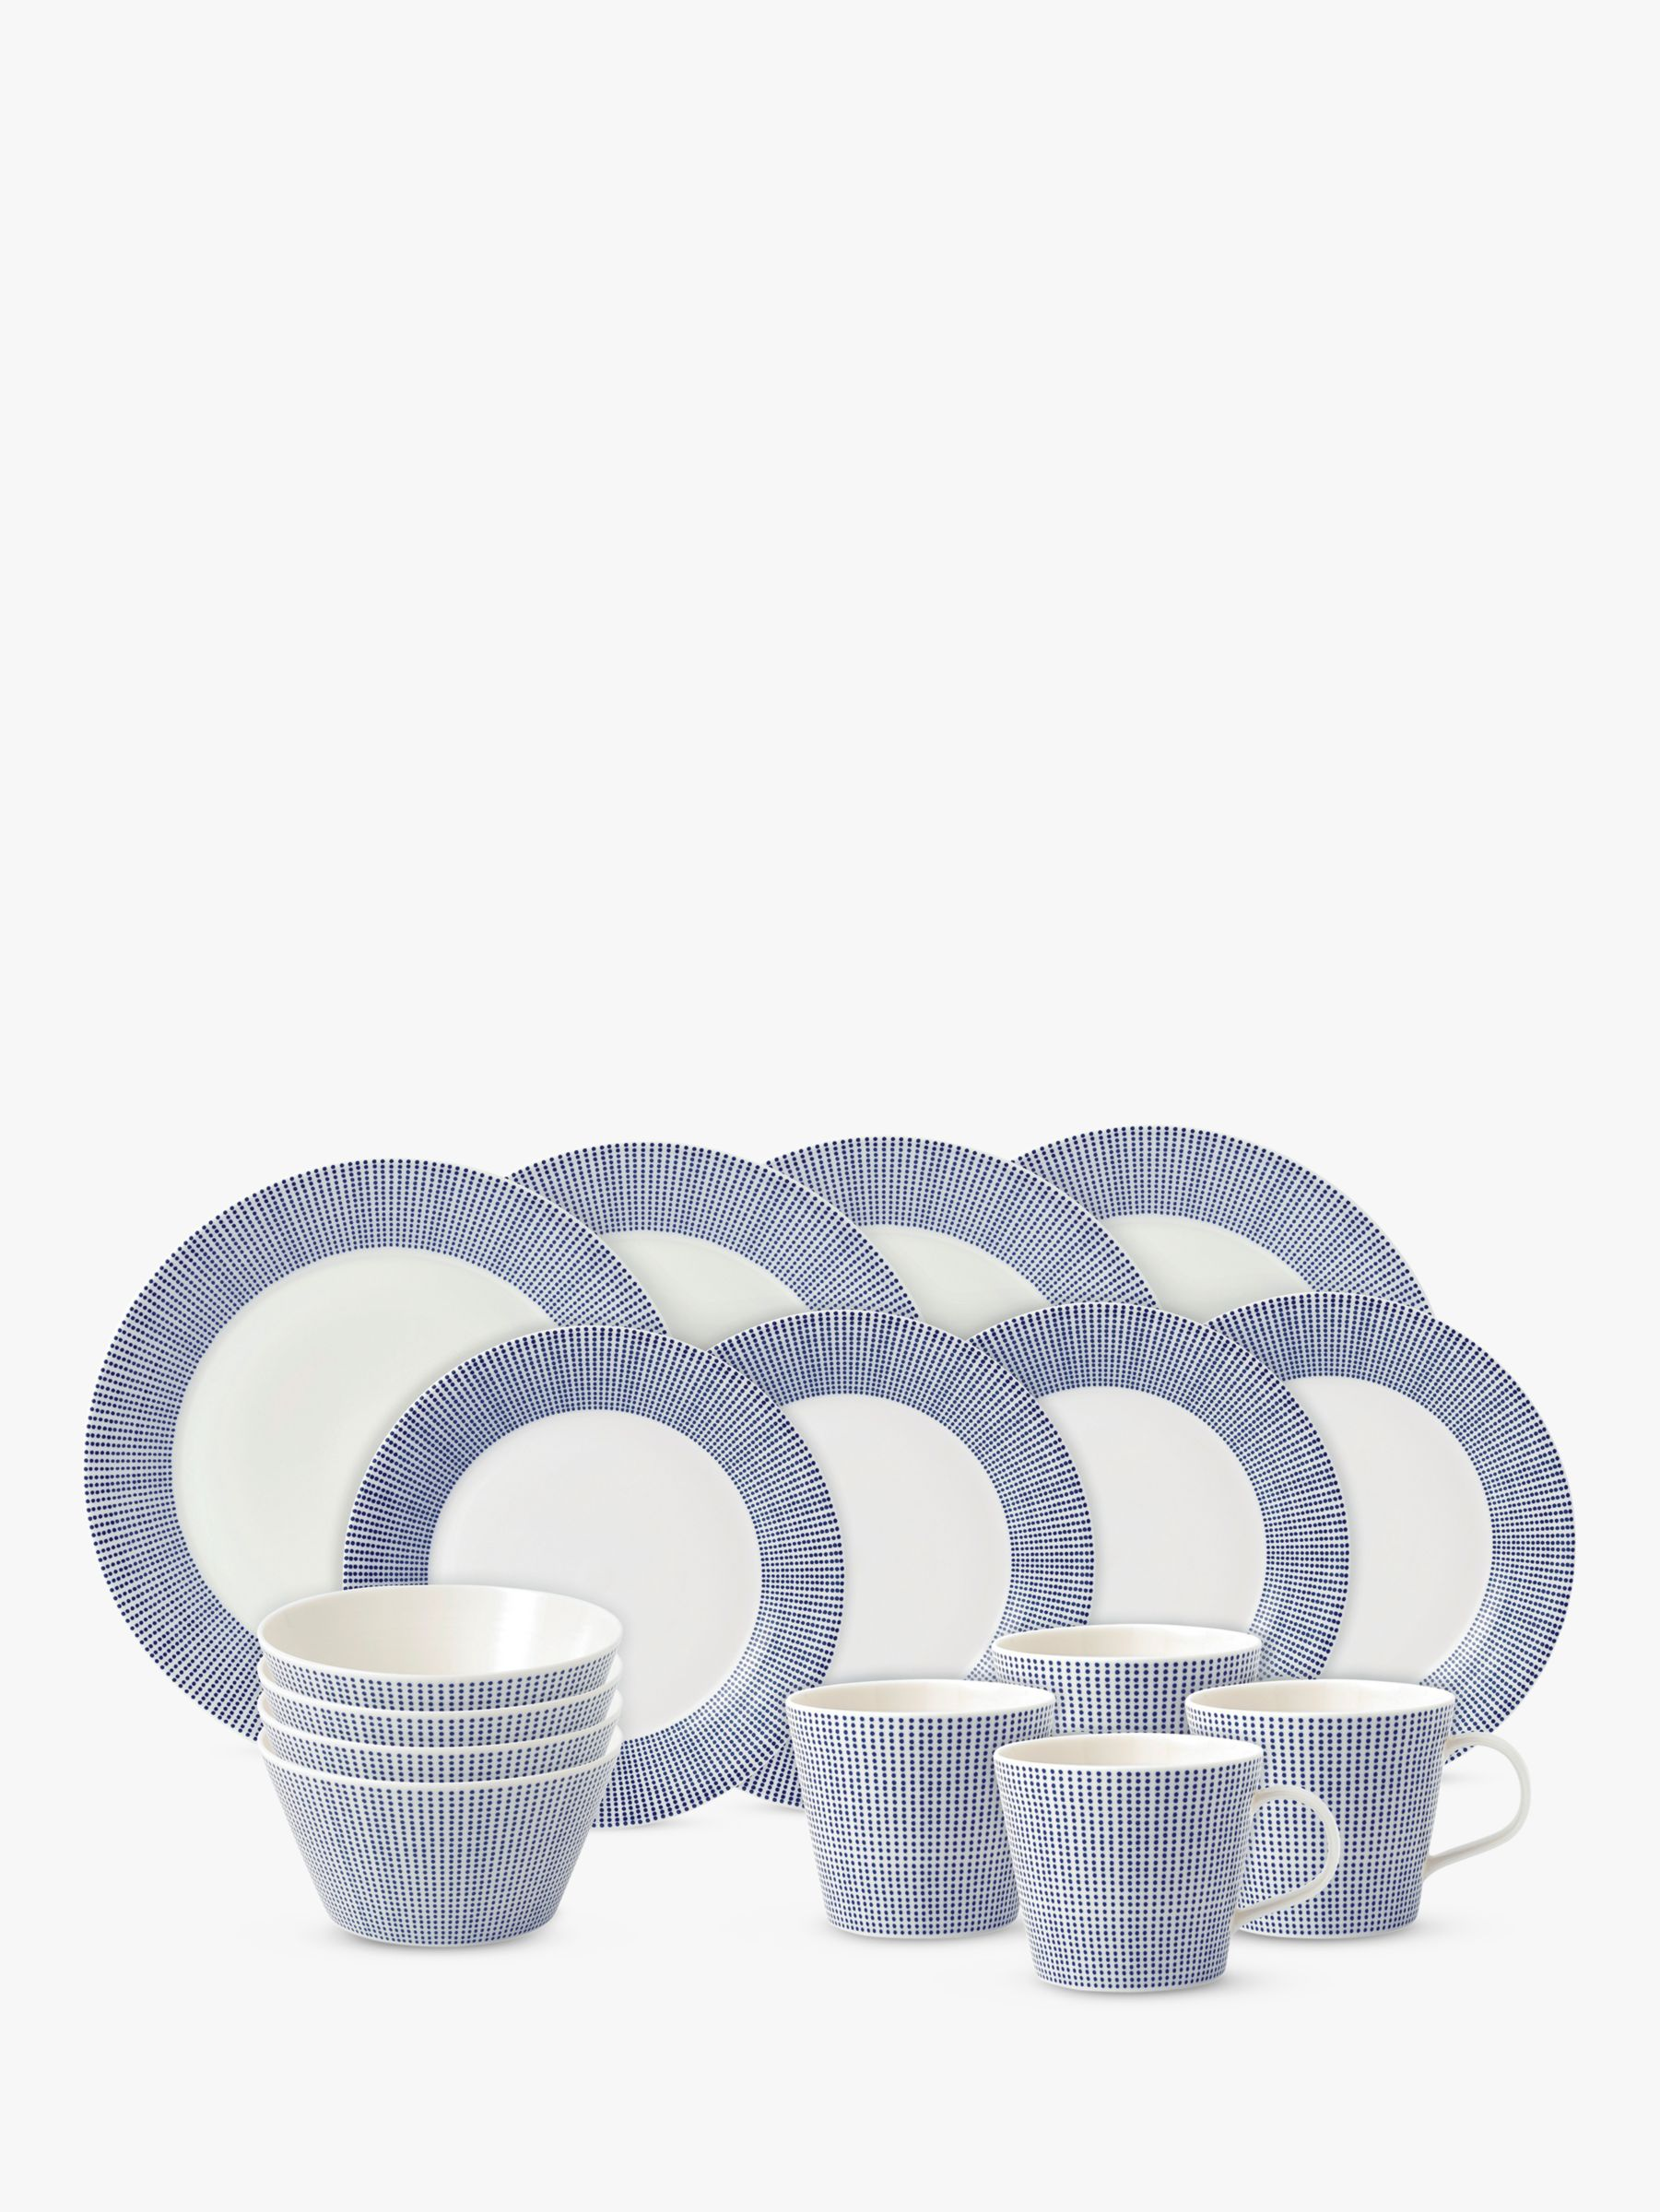 Royal Doulton Royal Doulton Pacific Porcelain China Dinnerware Set, 16 Piece, Blue